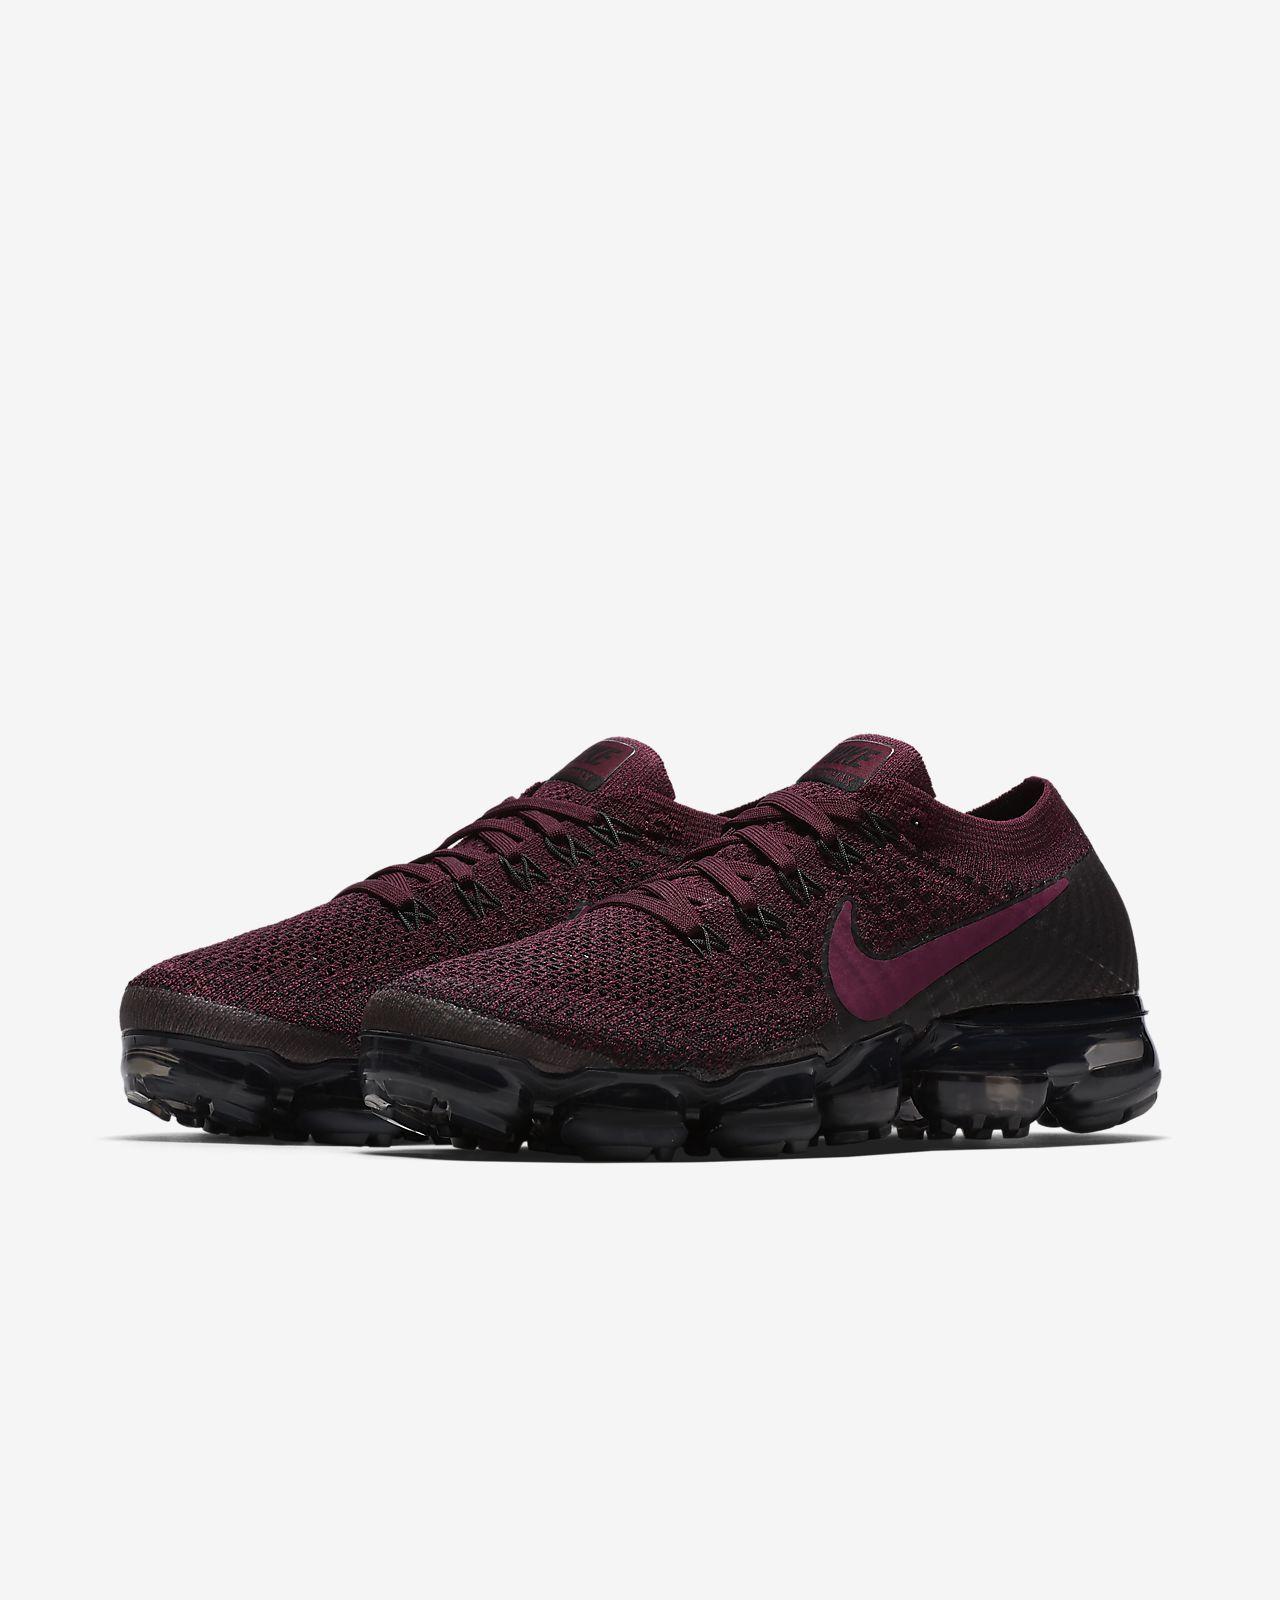 Nike Air VaporMax Flyknit Women's Running Shoe Bordeaux